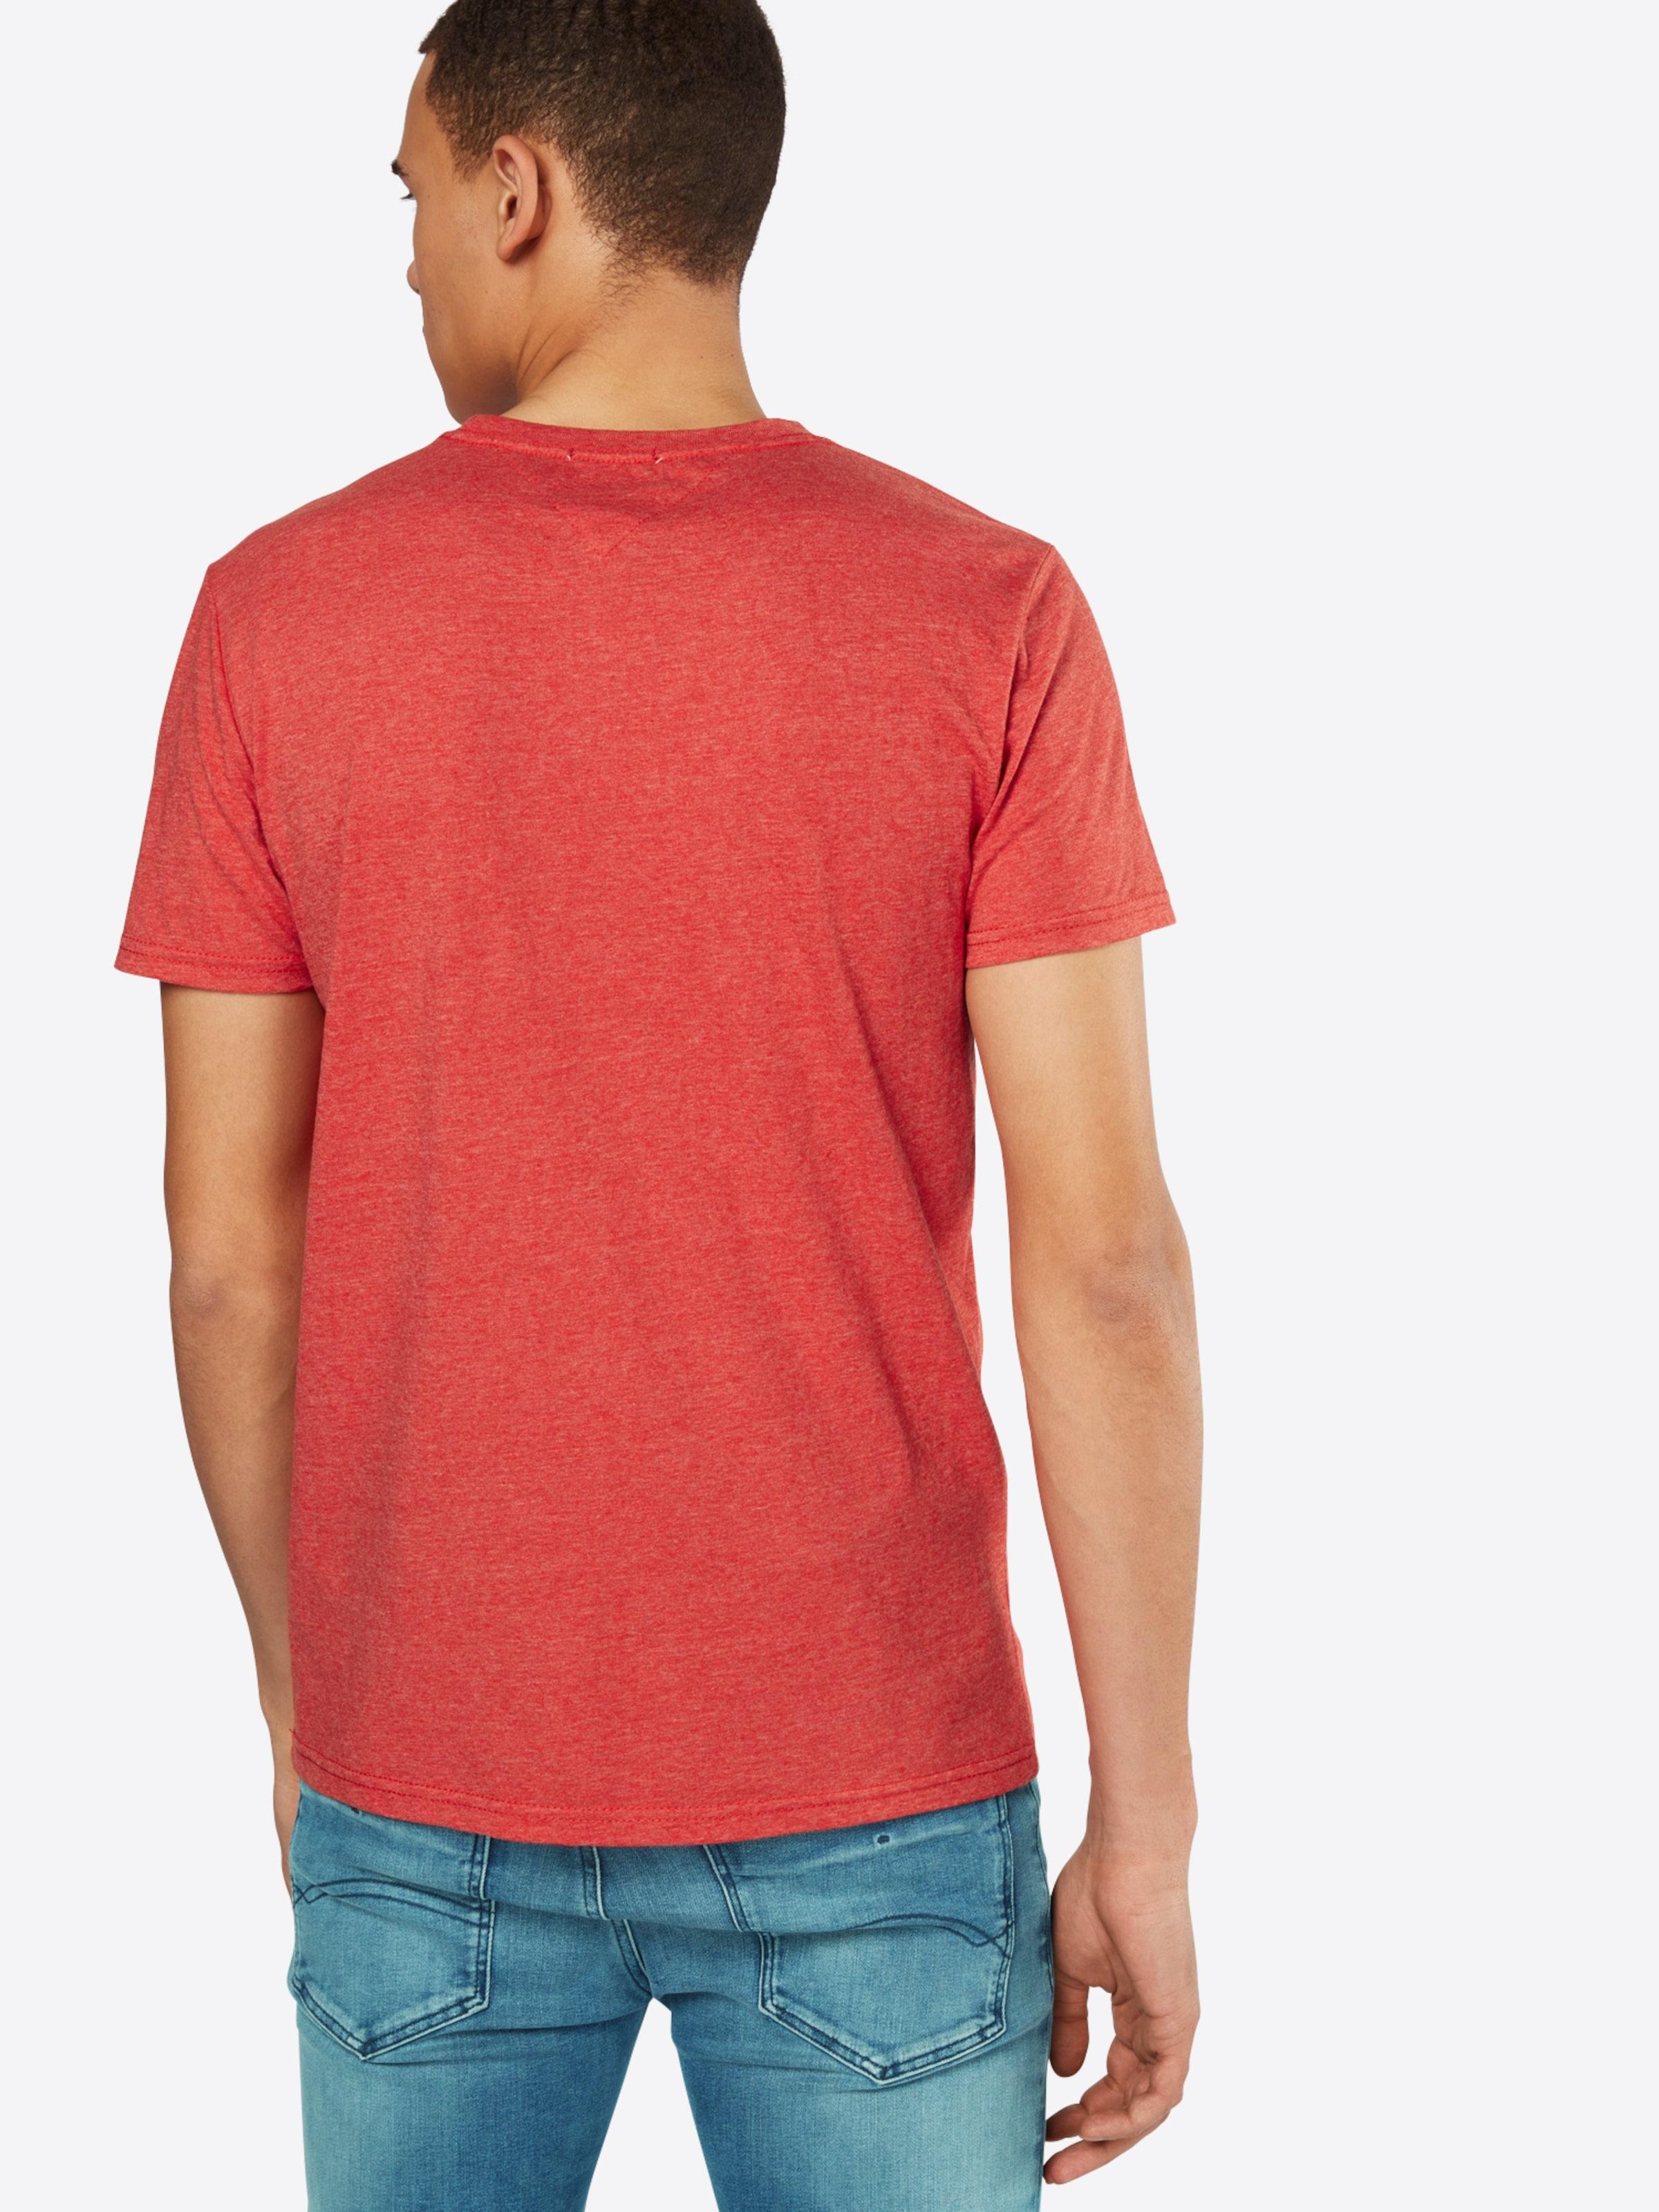 Rabatte Bester Großhandel Zu Verkaufen Tommy Jeans T-Shirt 'TJM ESSENTIAL LOGO' TA3SJBHqkq